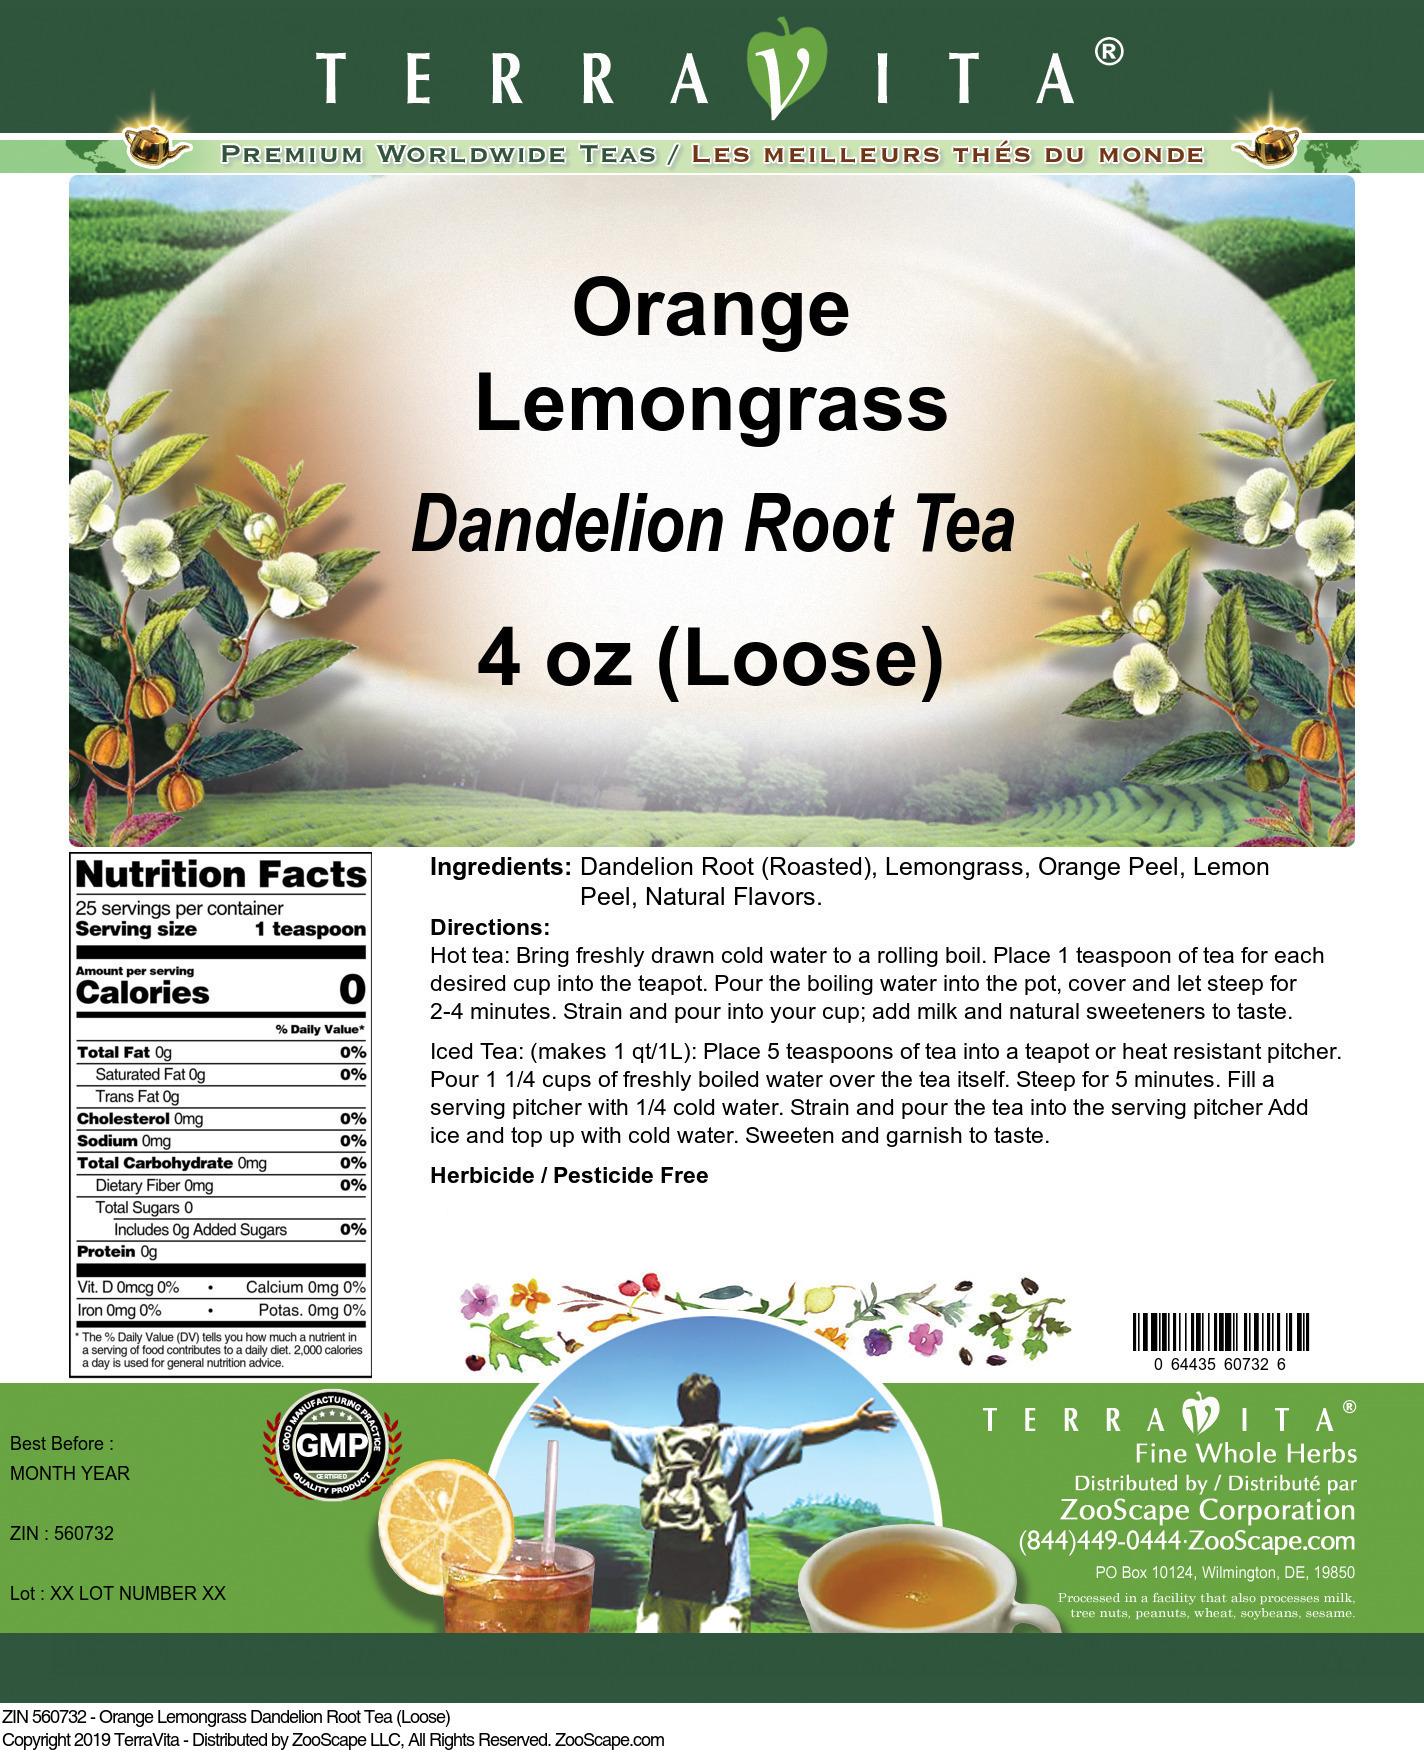 Orange Lemongrass Dandelion Root Tea (Loose)